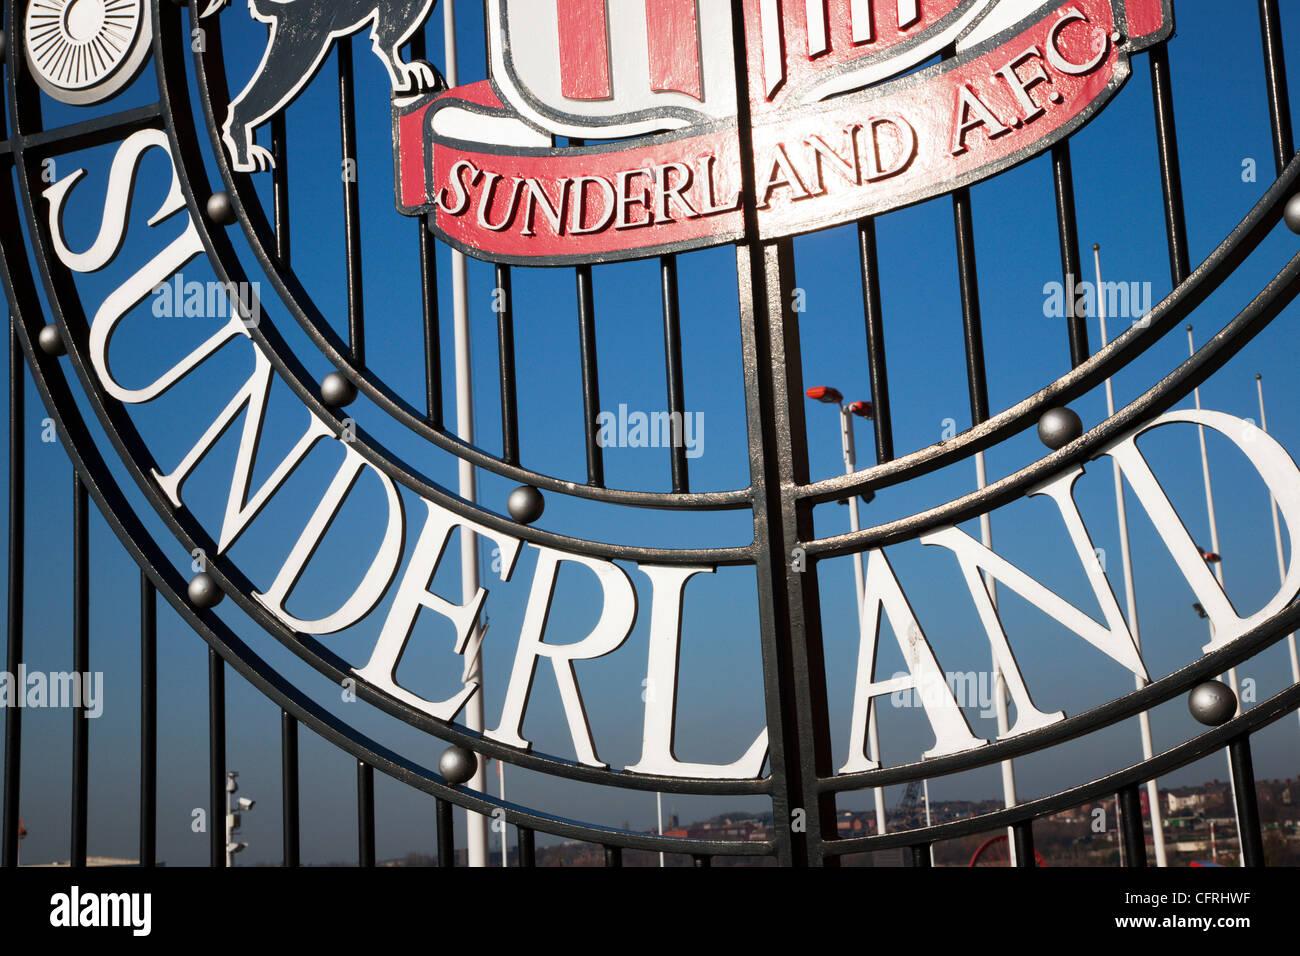 Gate at The Stadium of Light Sunderland England - Stock Image